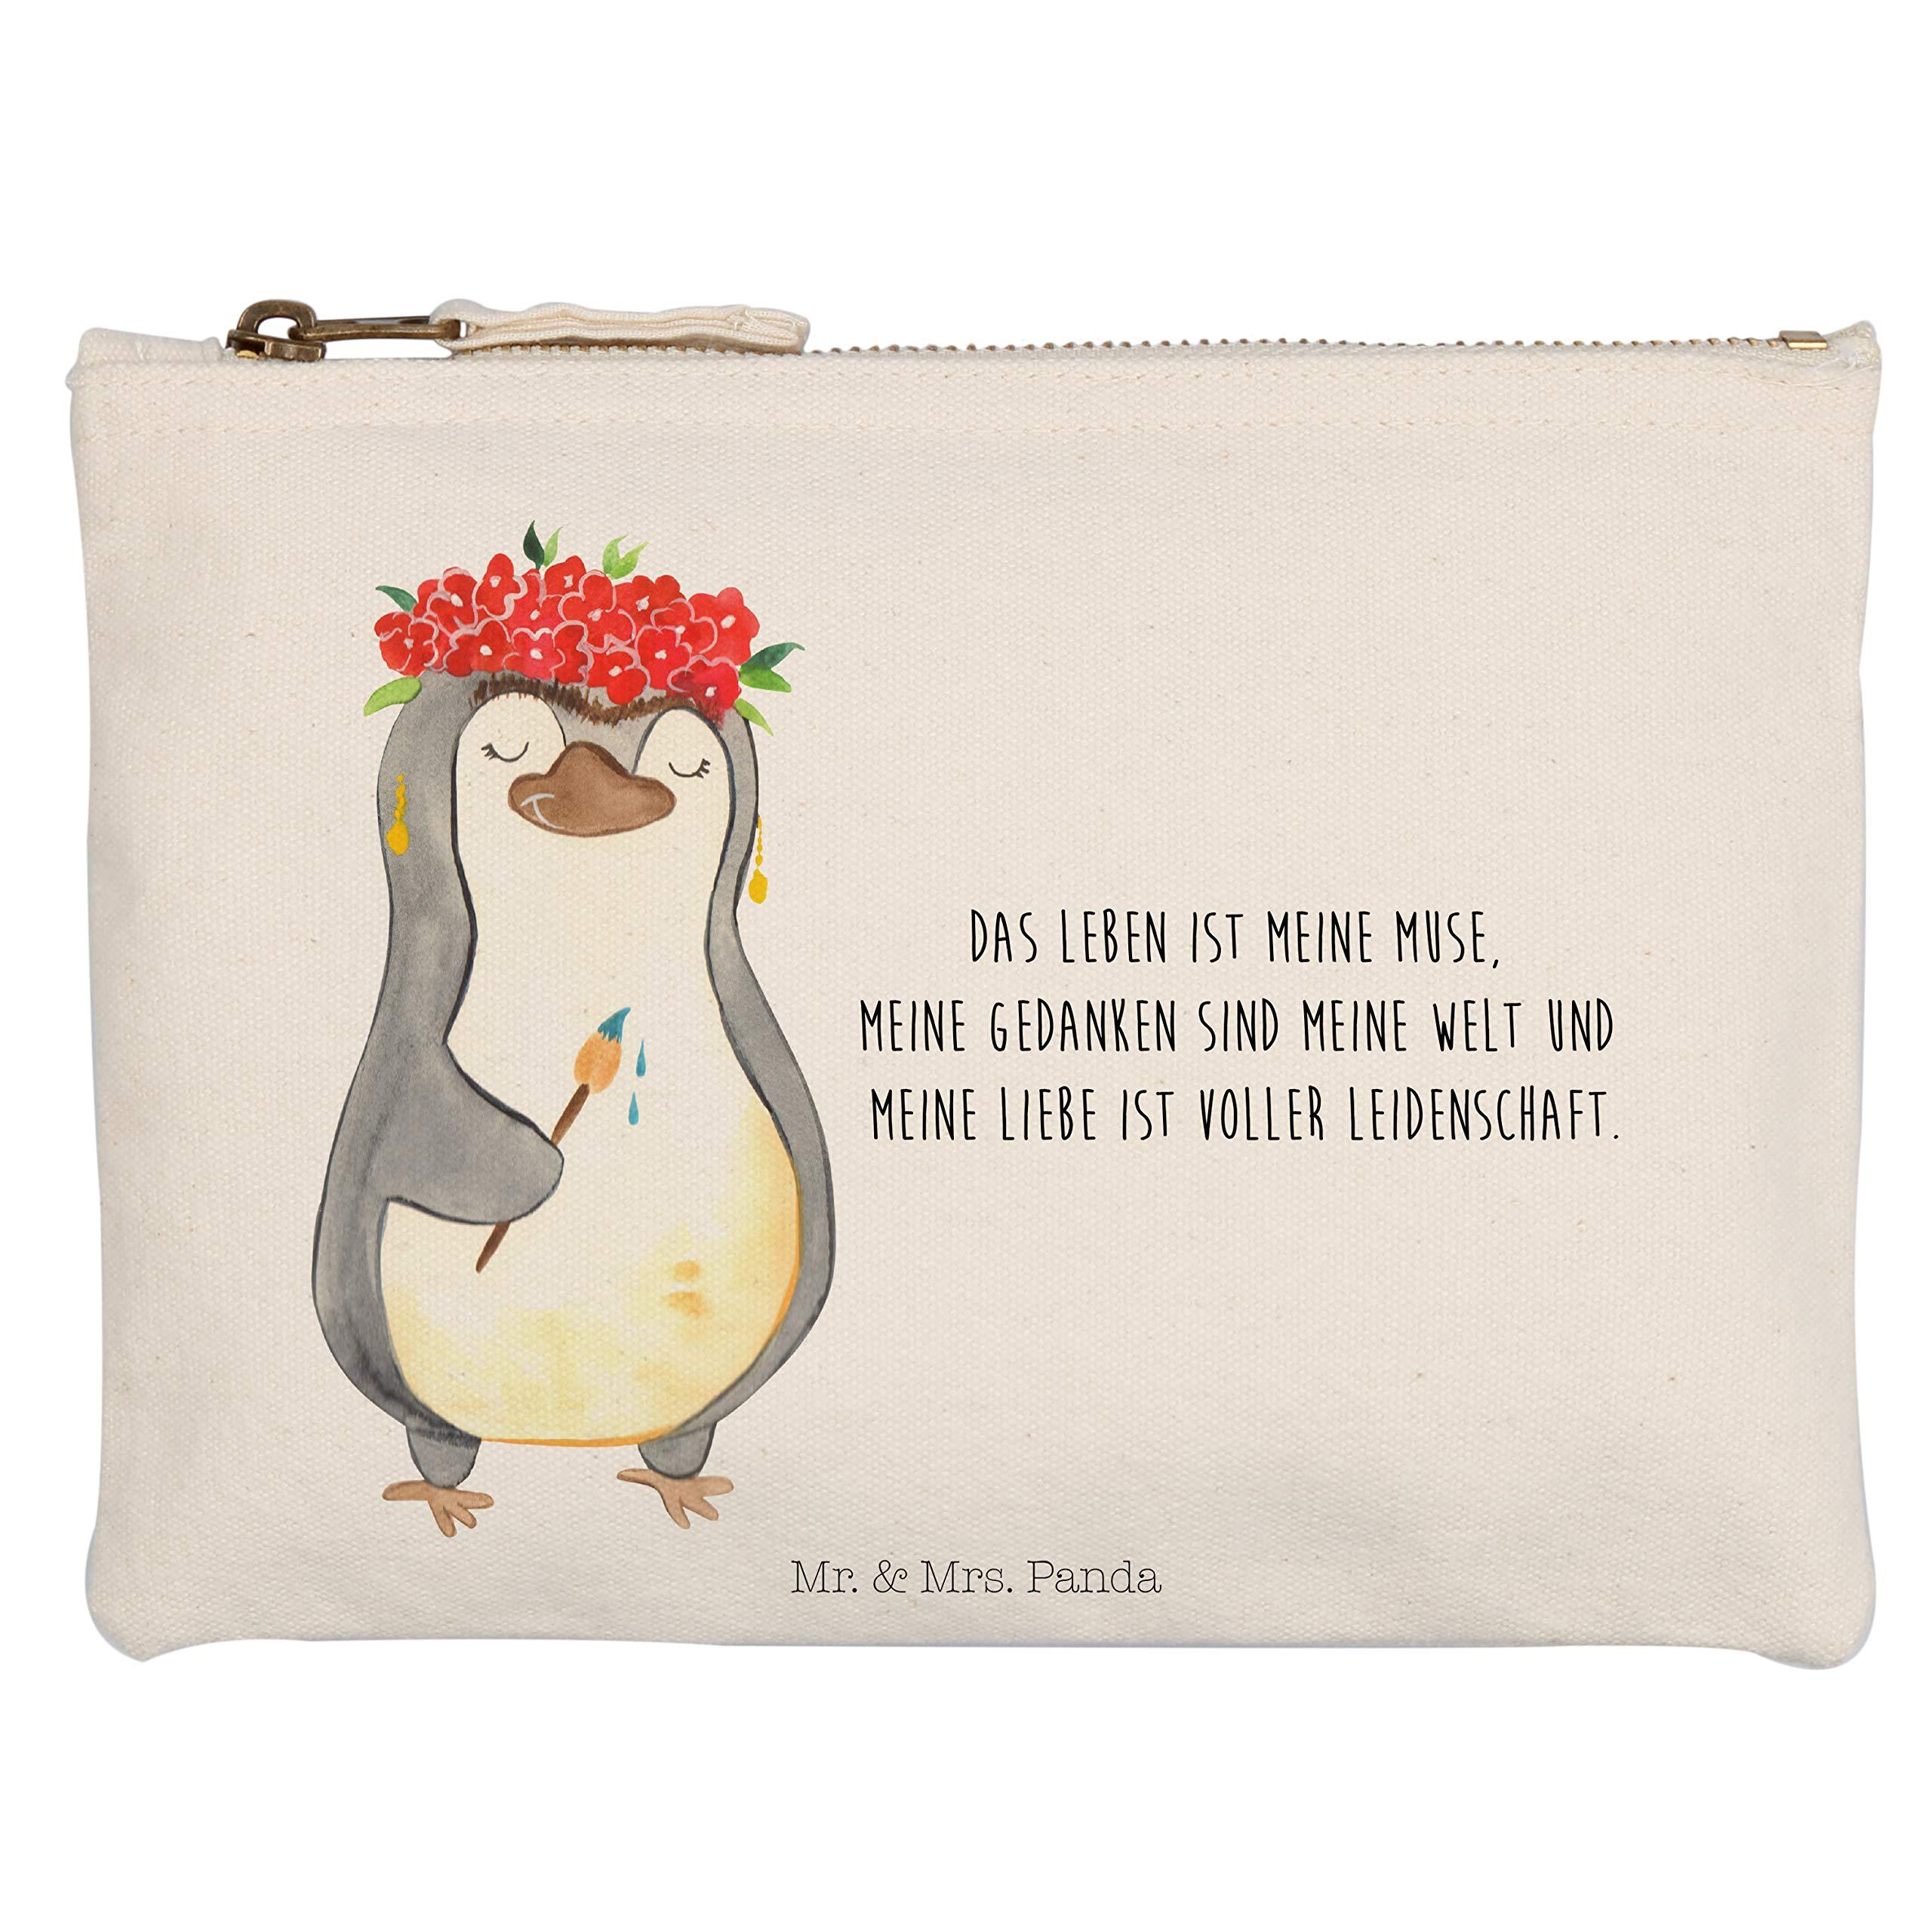 Mr. & Mrs. Panda L Maquillaje Pingüino Frida Kahlo – 100% Handmade – Frida Kahlo, pintora, Star, Pingüino, Pintores, Frida, Kahlo, México, autorrealización, vorbild Maquillaje, Neceser, Neceser, LandLeder, funda, estuche, maquillaje, XXL: